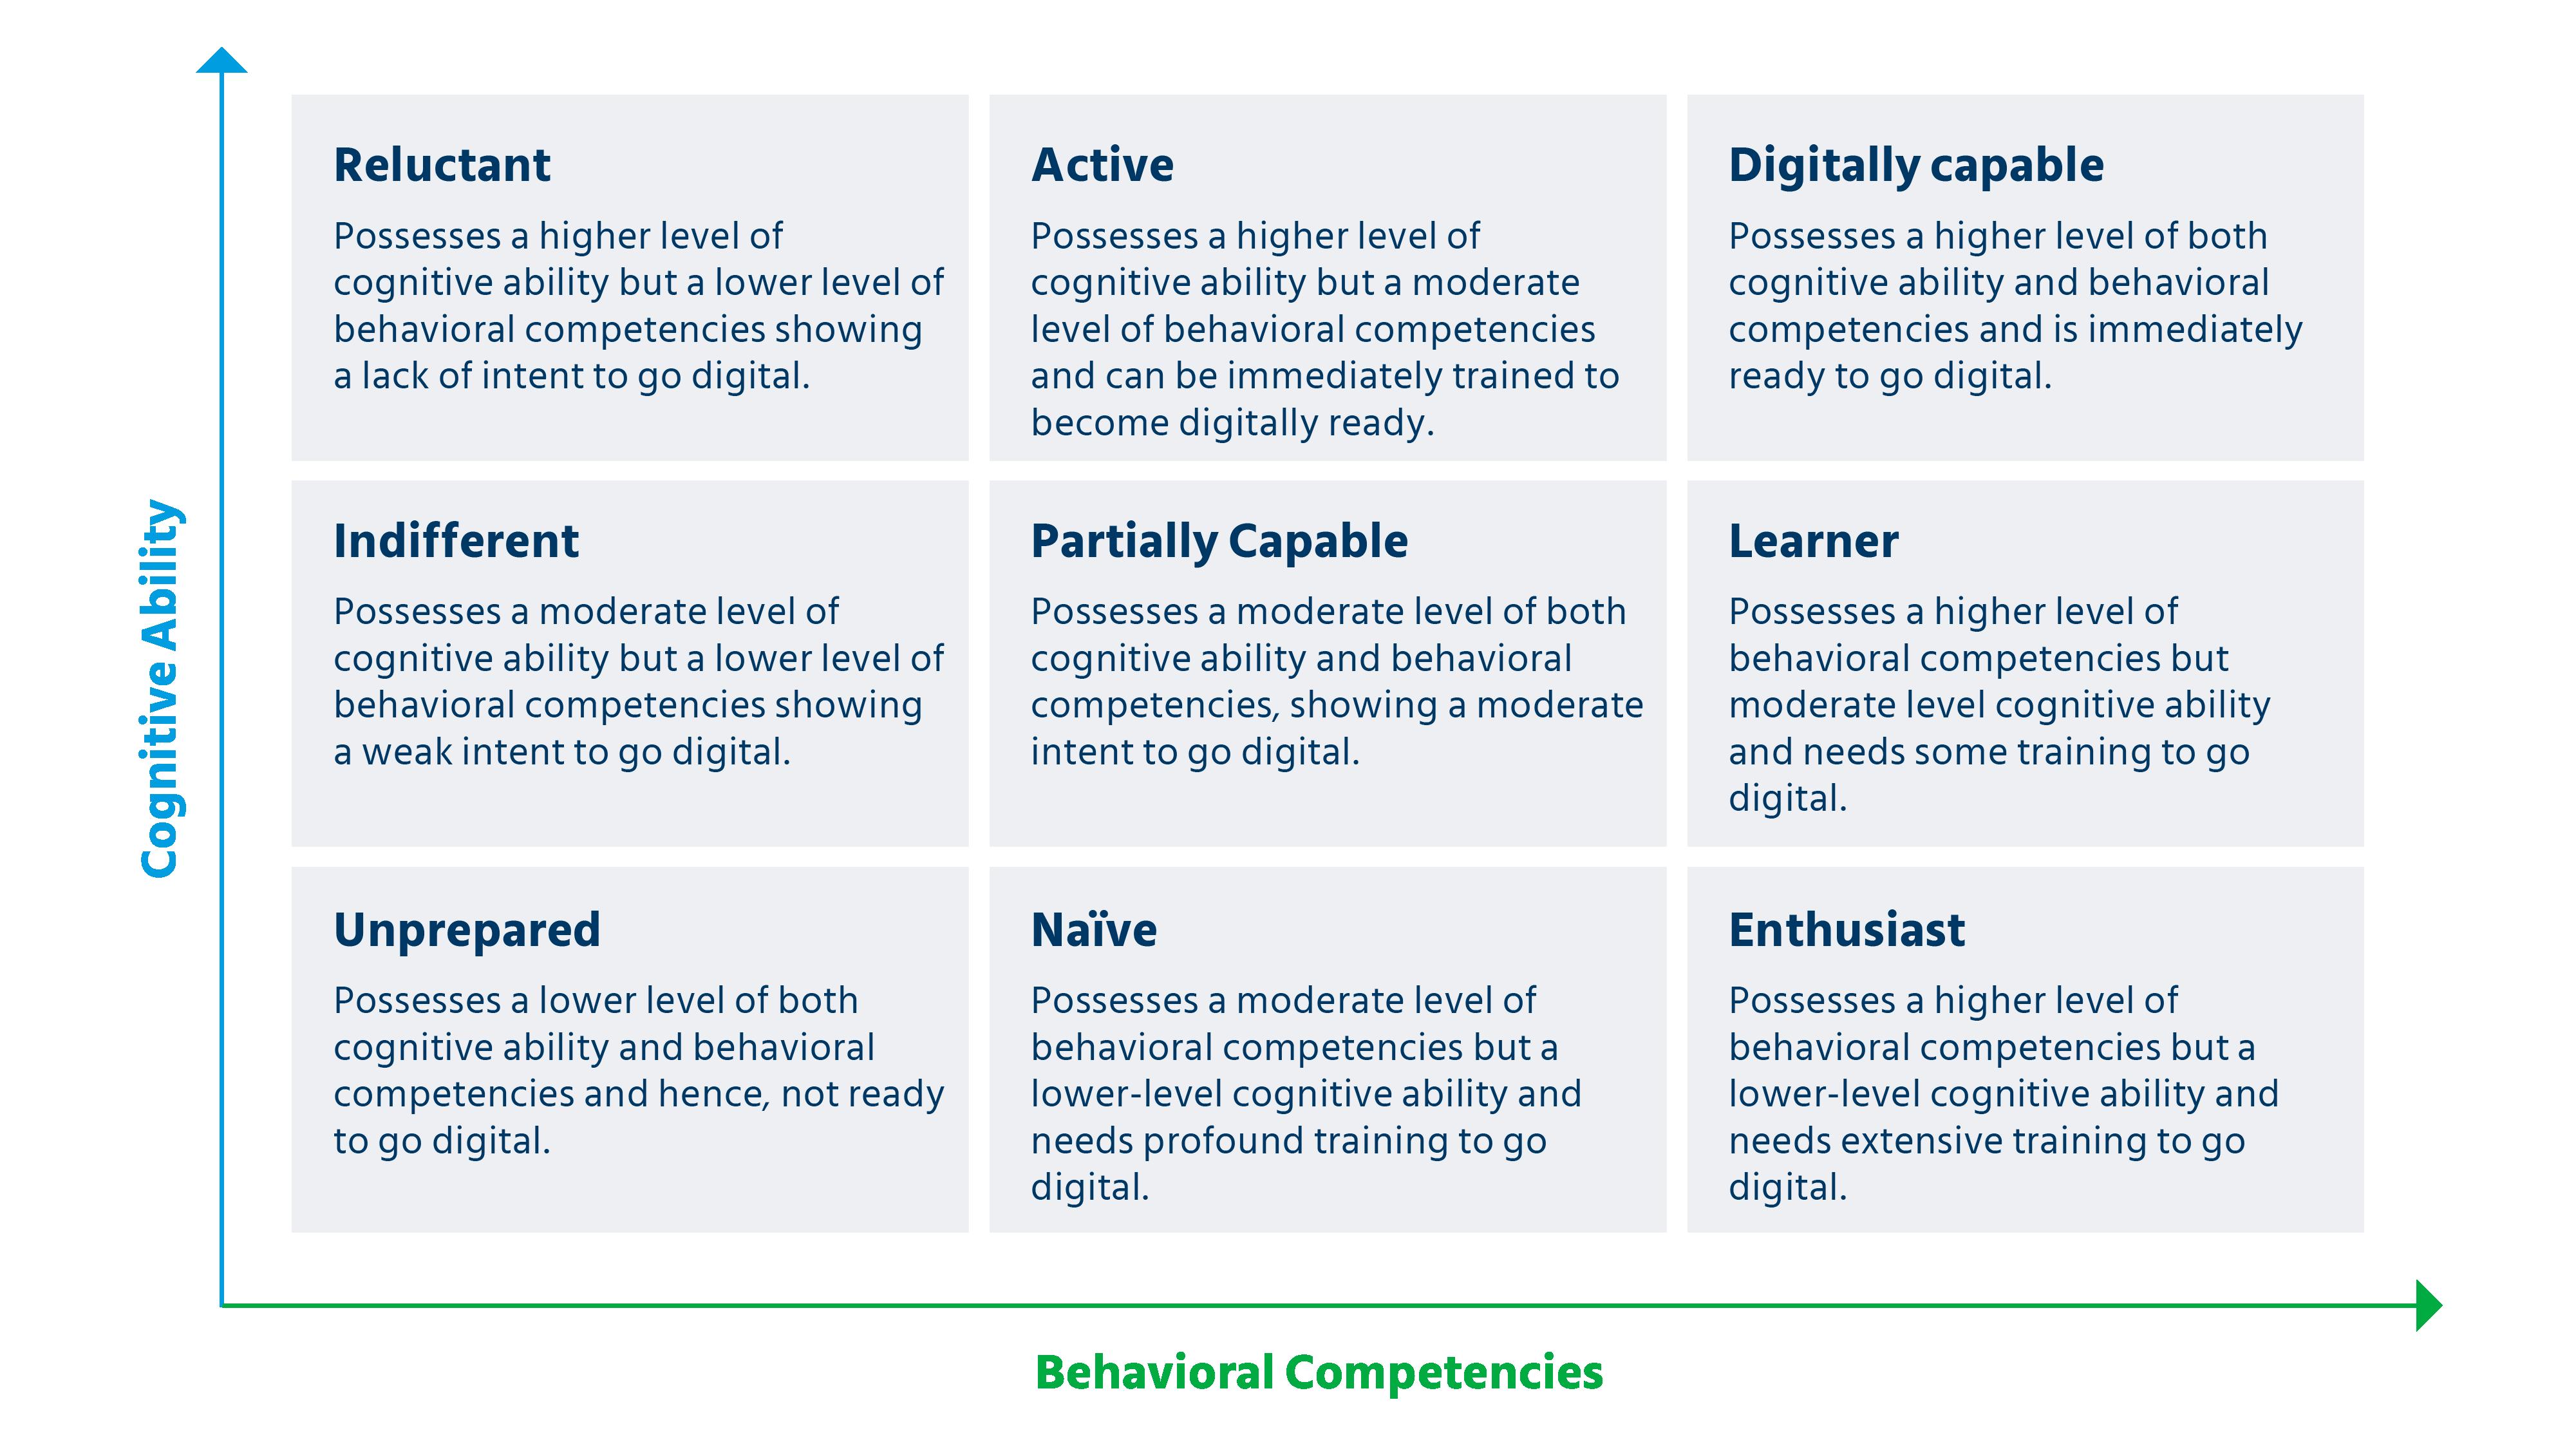 Digital readiness_Table 3